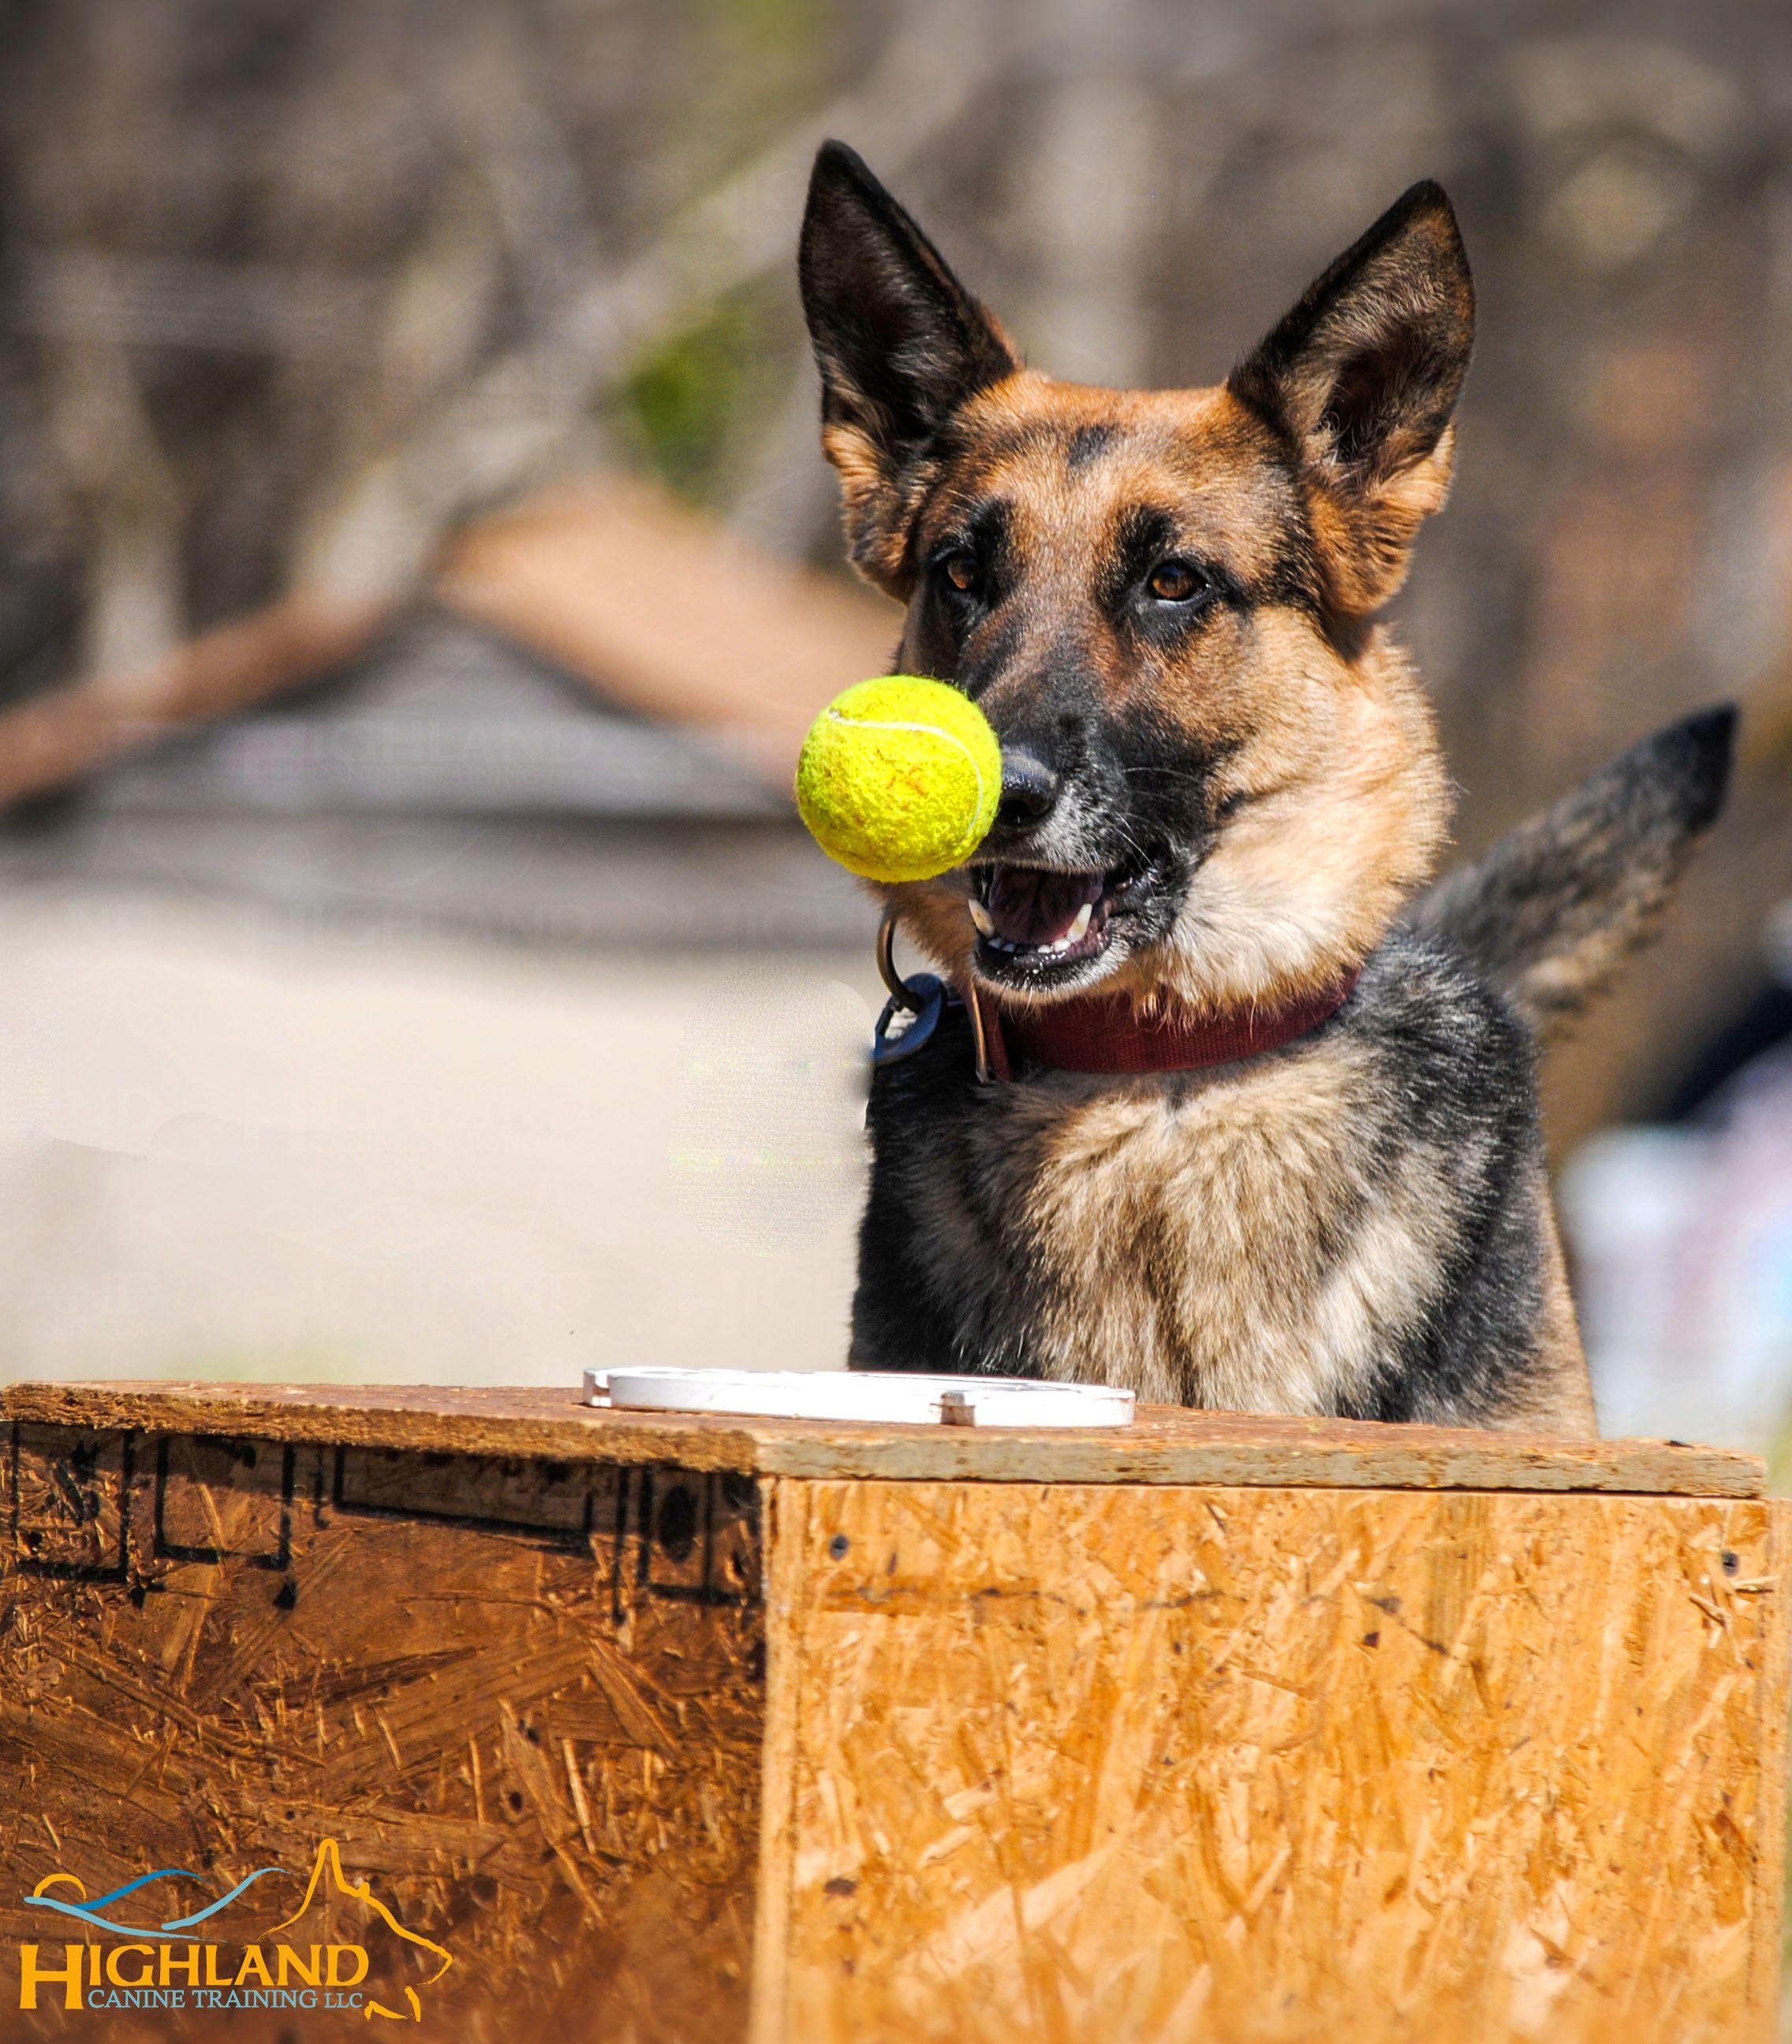 Detection dog training at its best germanshepherd